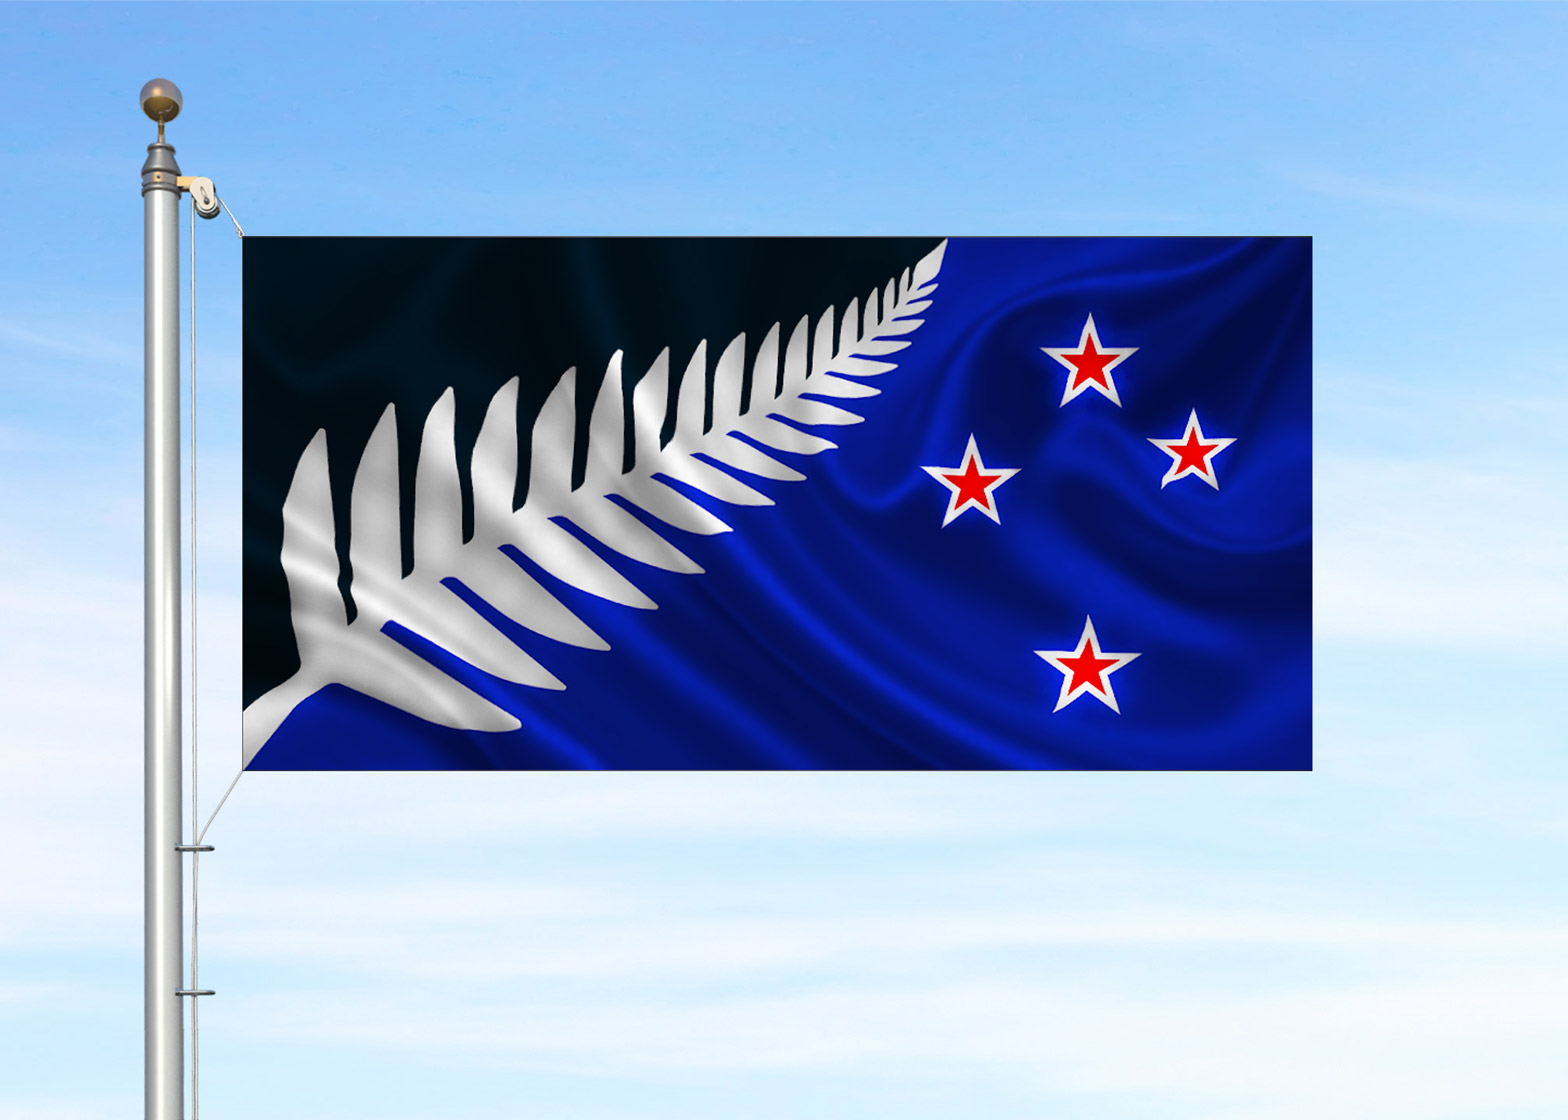 New Zealand Silver Fern flag by Kyle Lockwood